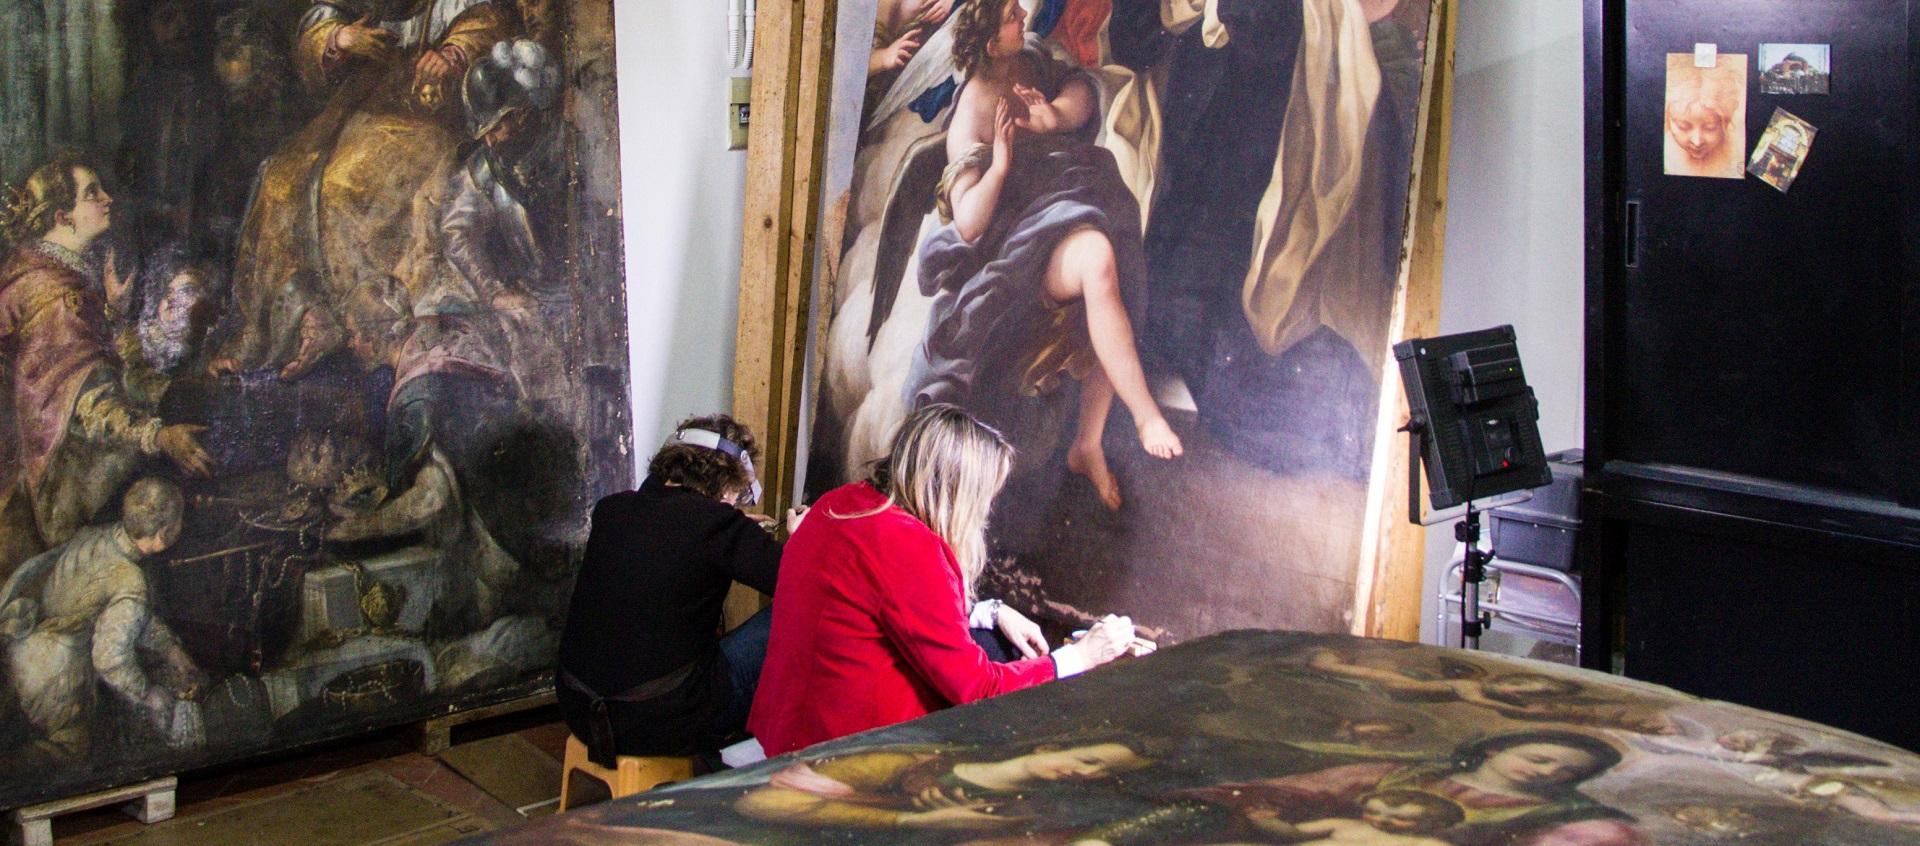 Conservators restoring masterwork by Violante Siries Cerroti